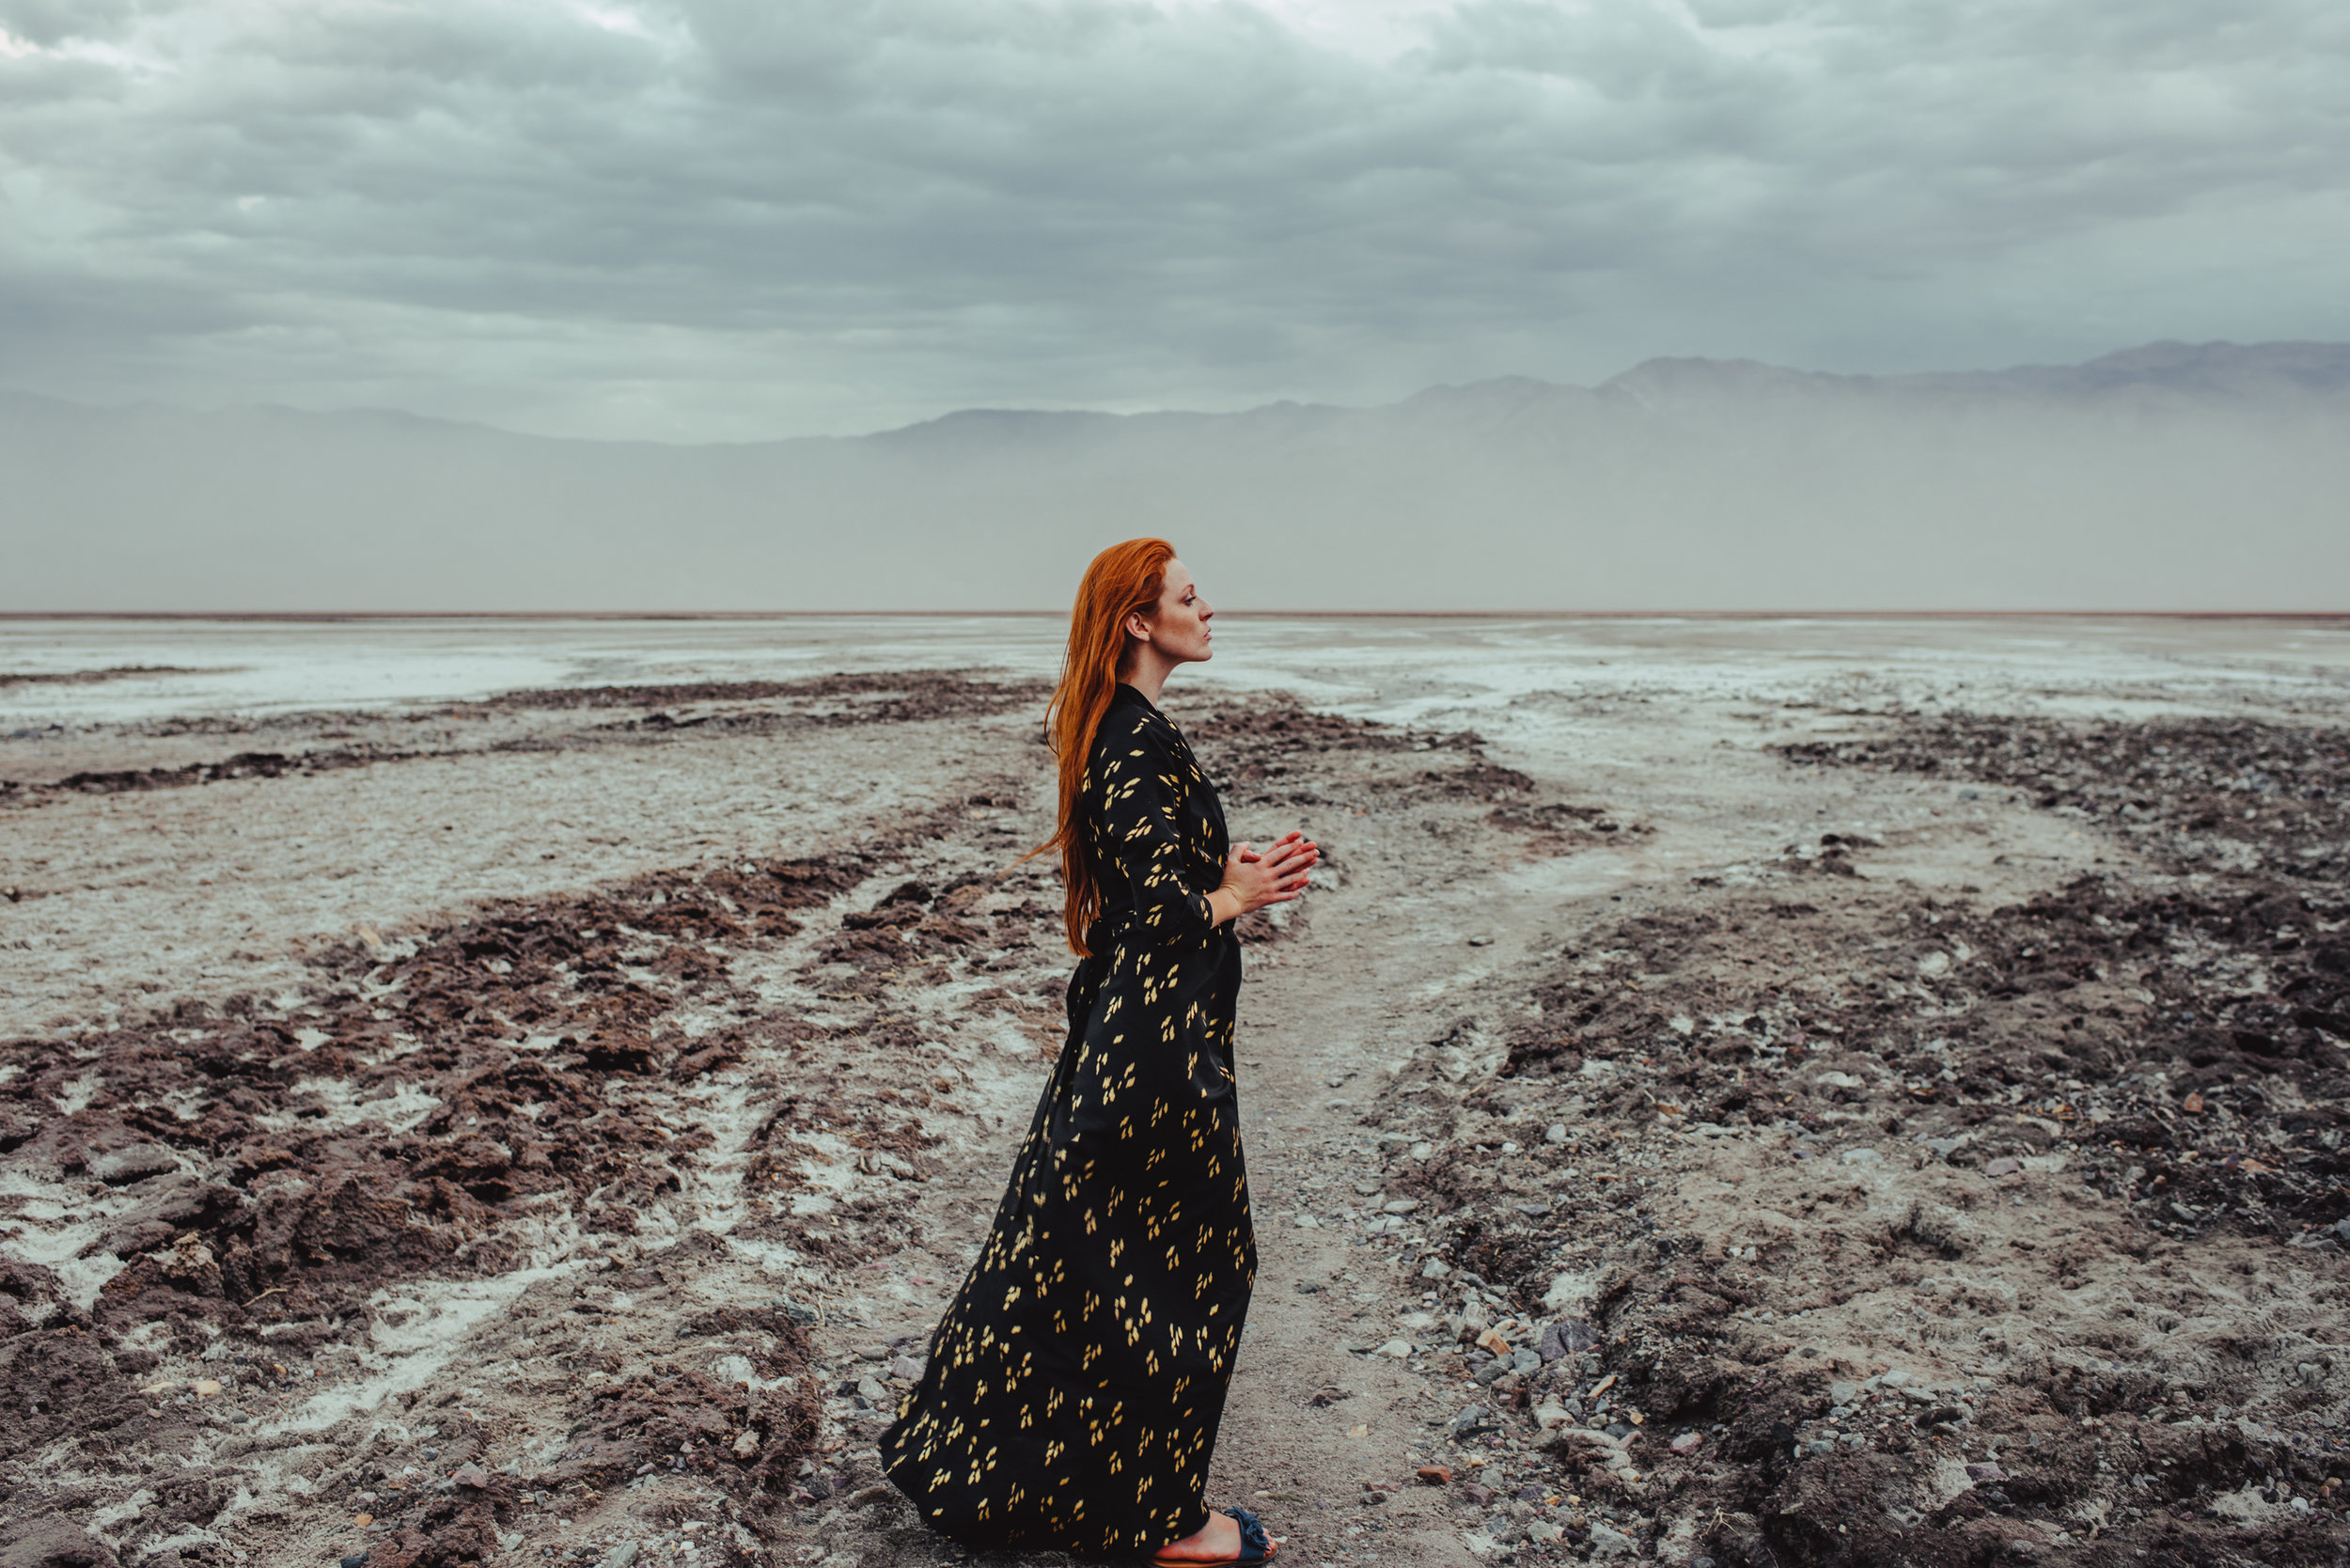 Death Valley Editorial Salt Flats editorial Las Vegas Photographer.jpg